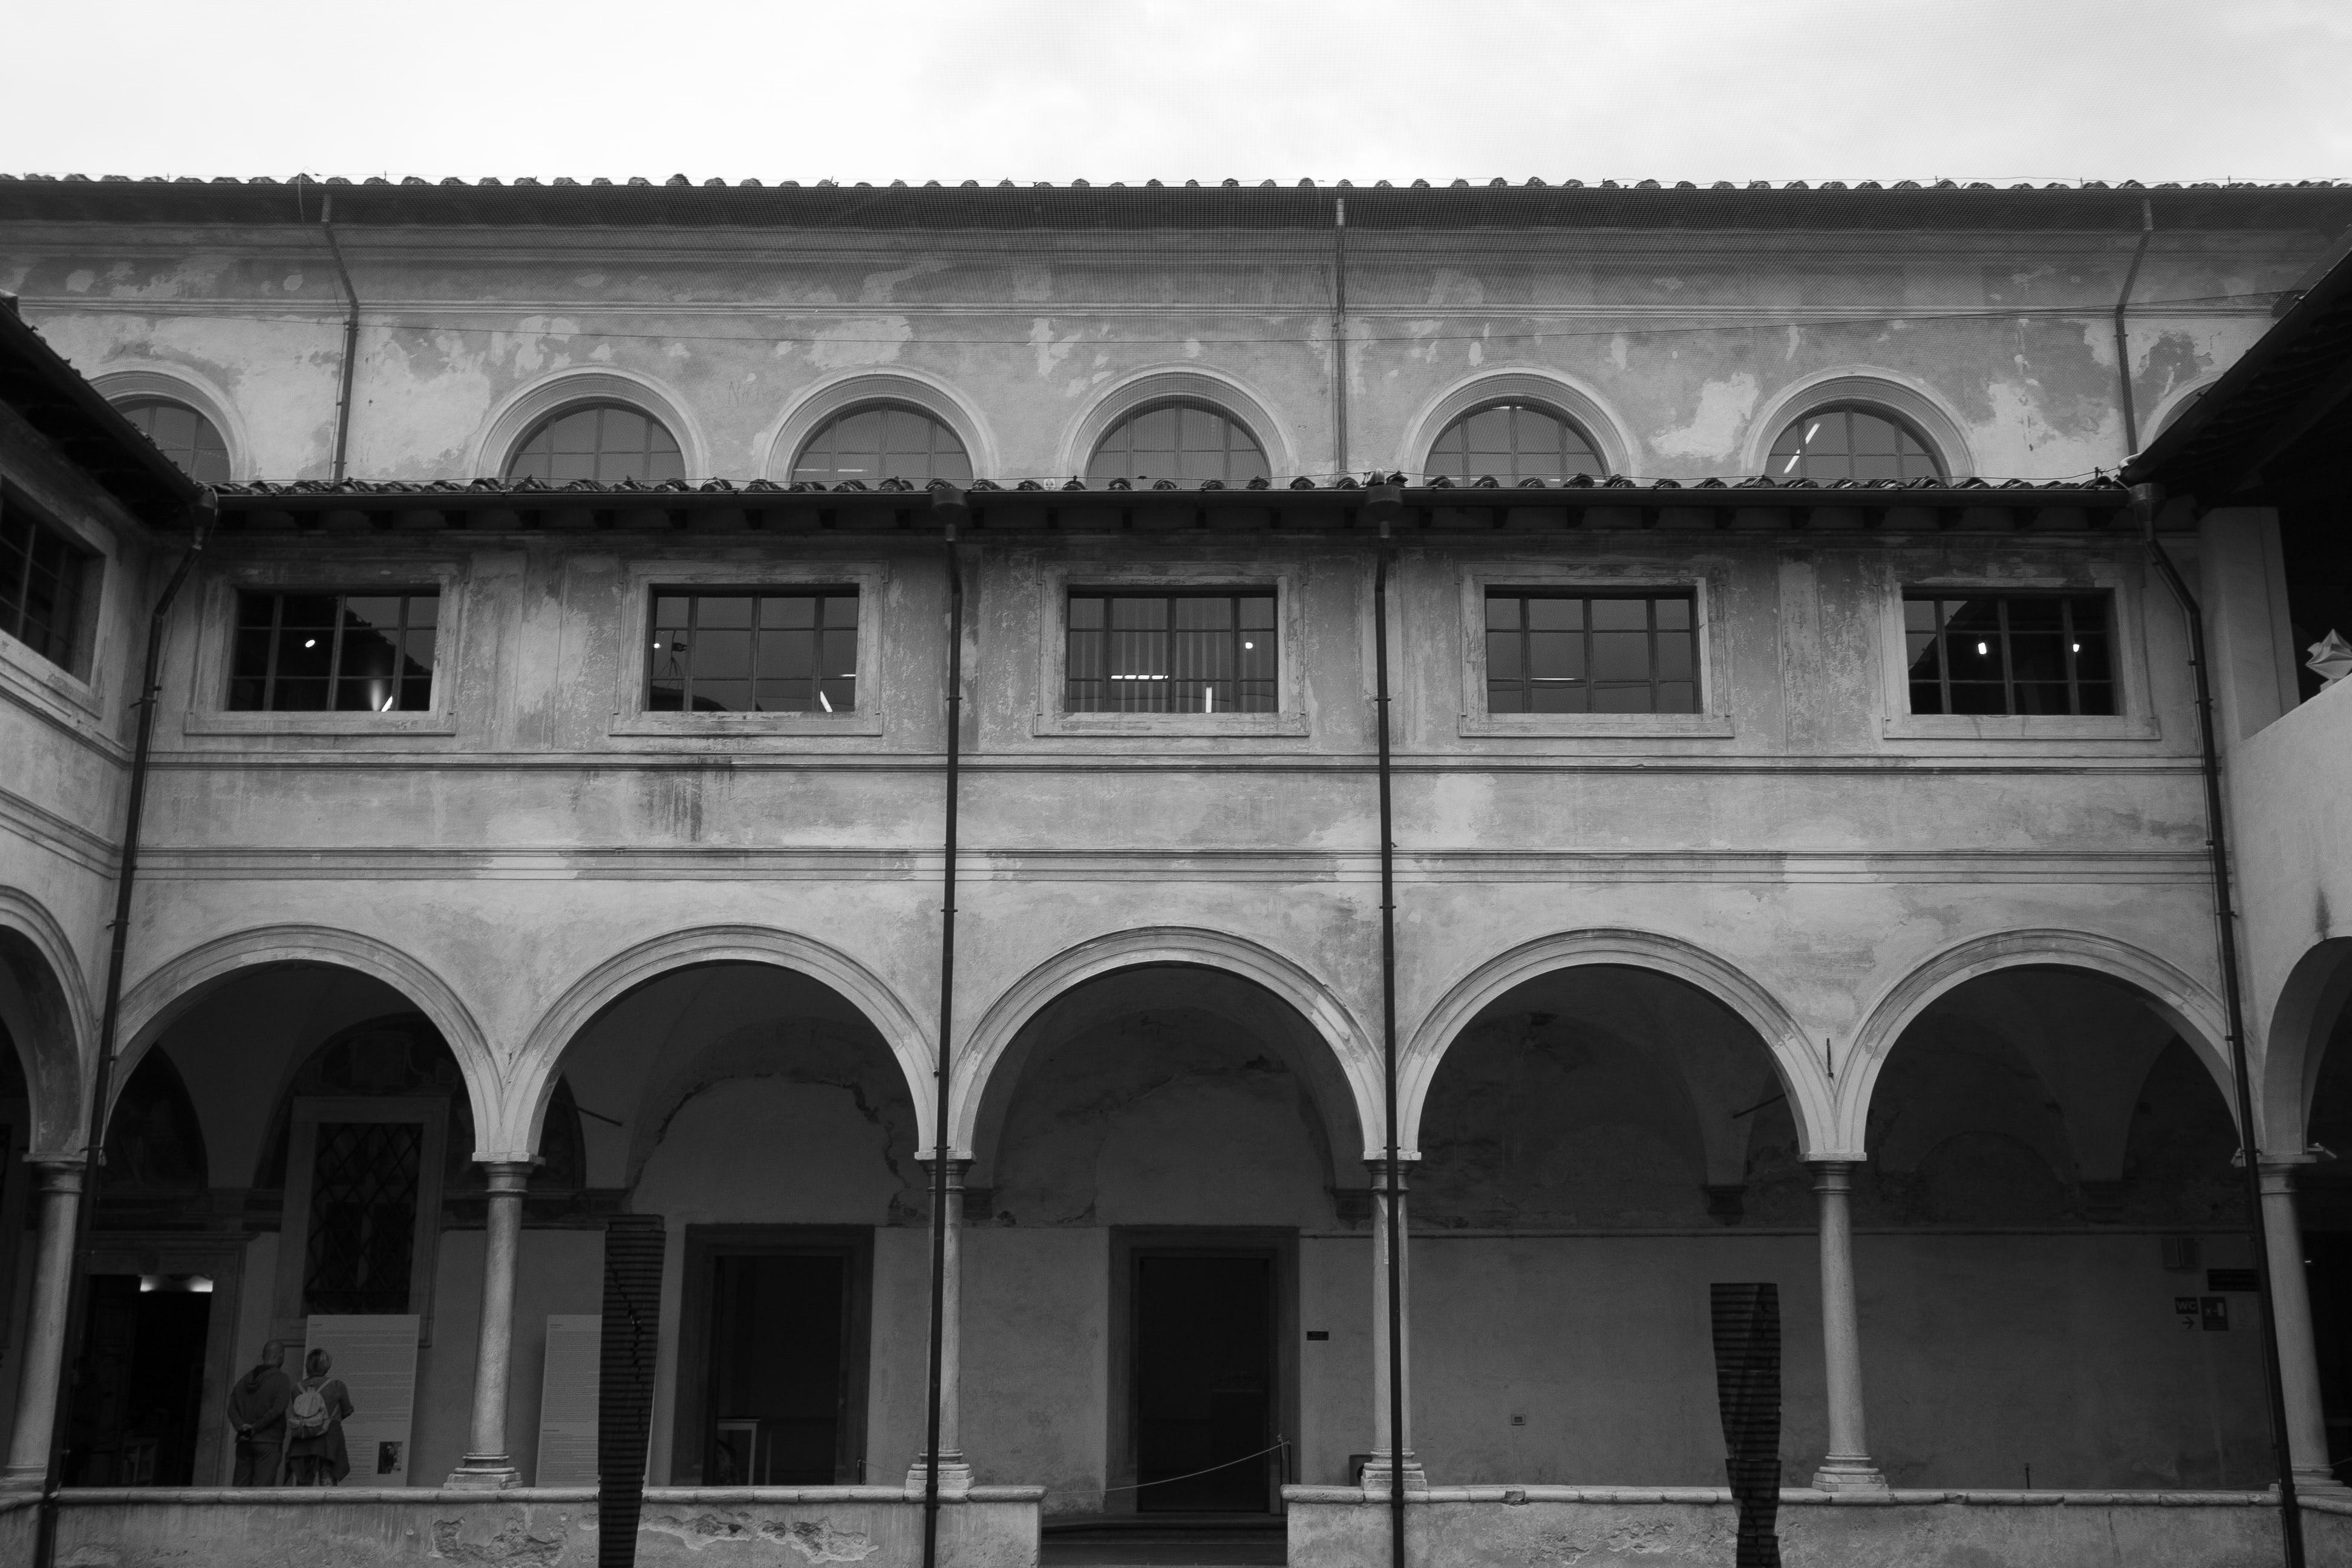 Sant'Agostino_bn-3-min